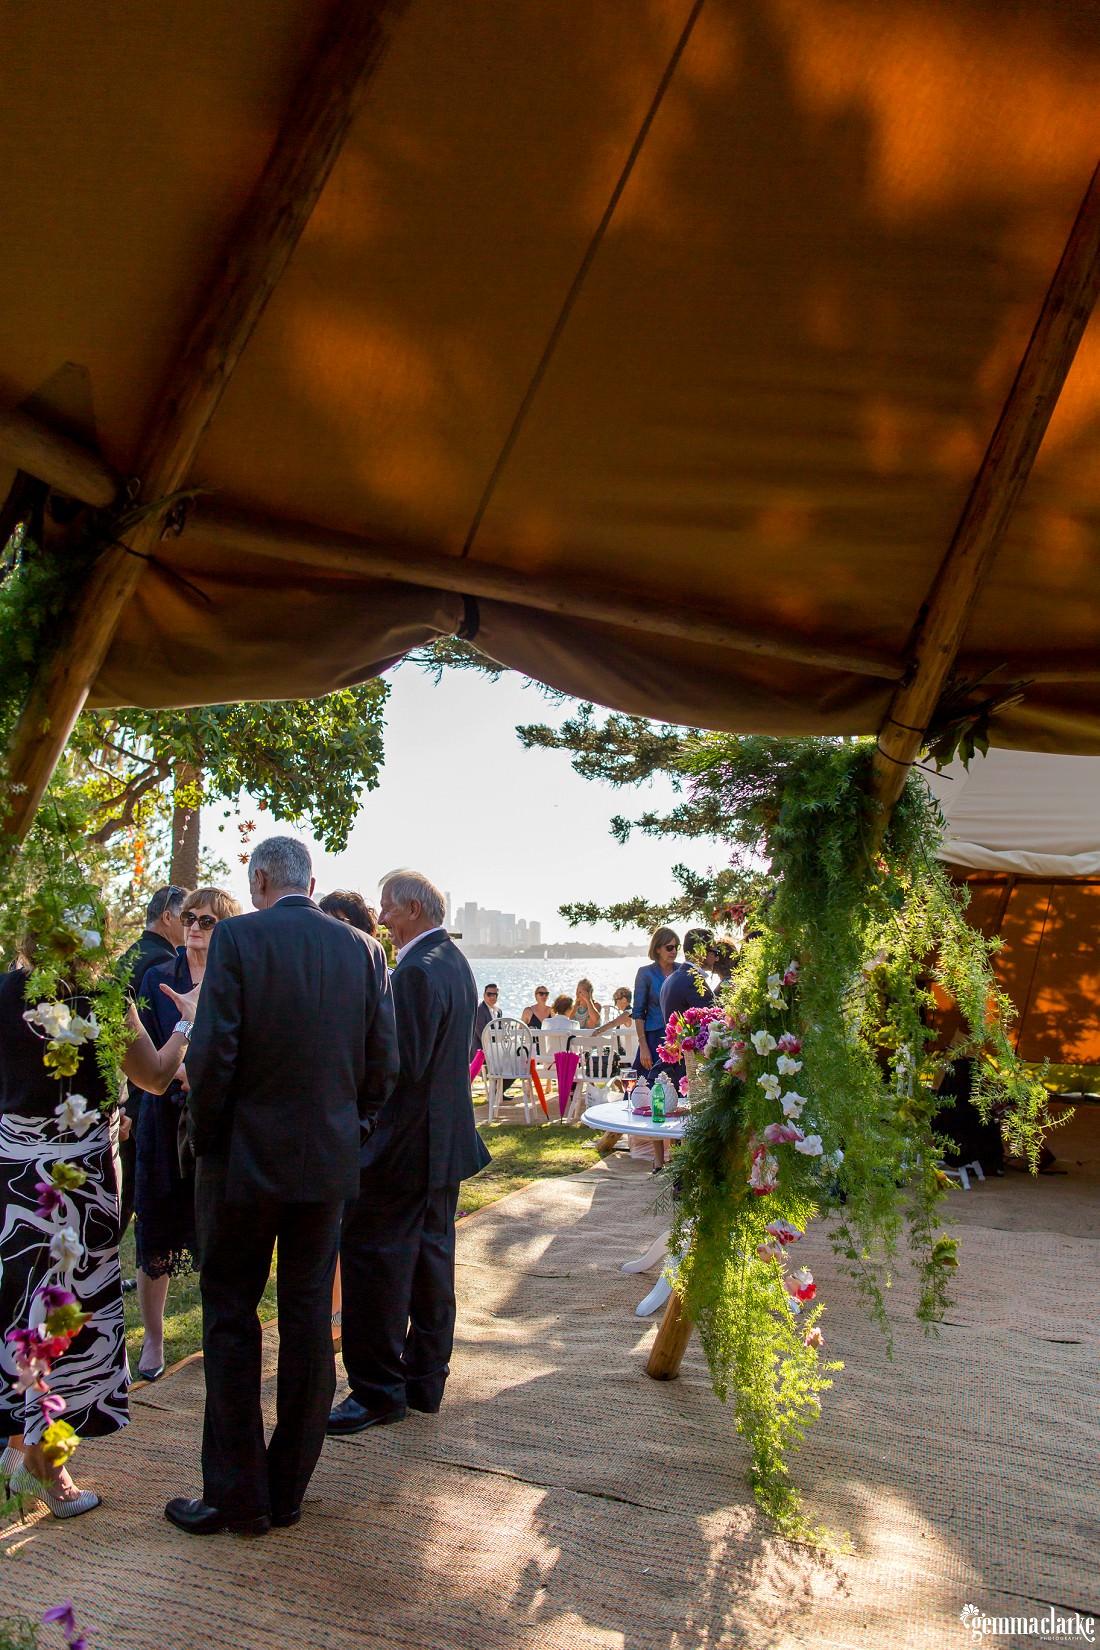 Wedding guests mingling